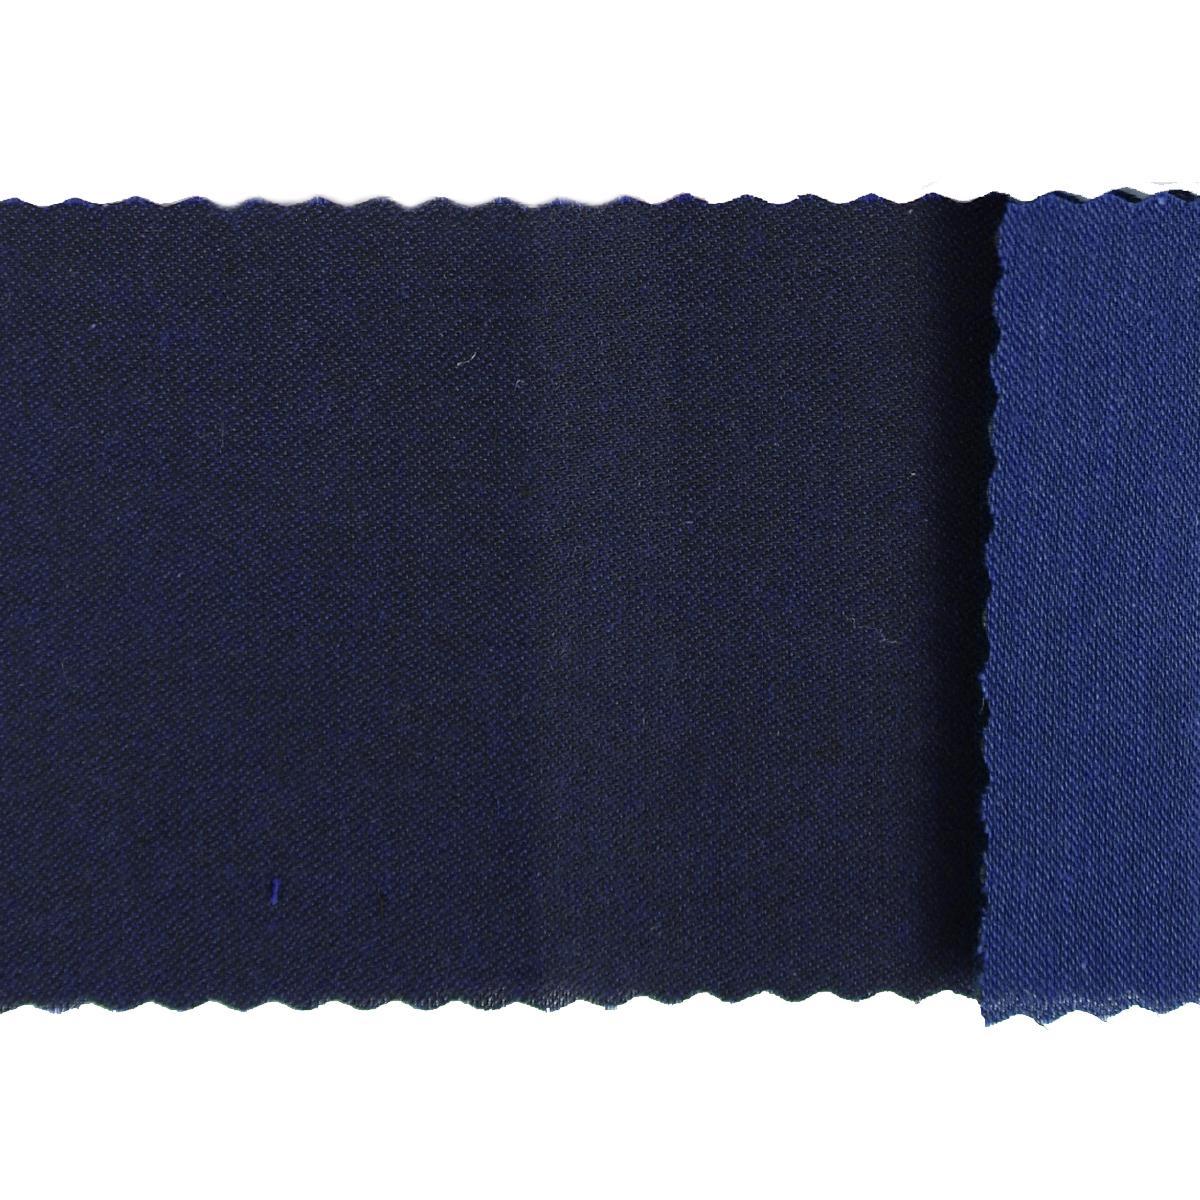 Tela algodón sarga hidrófuga azul marino